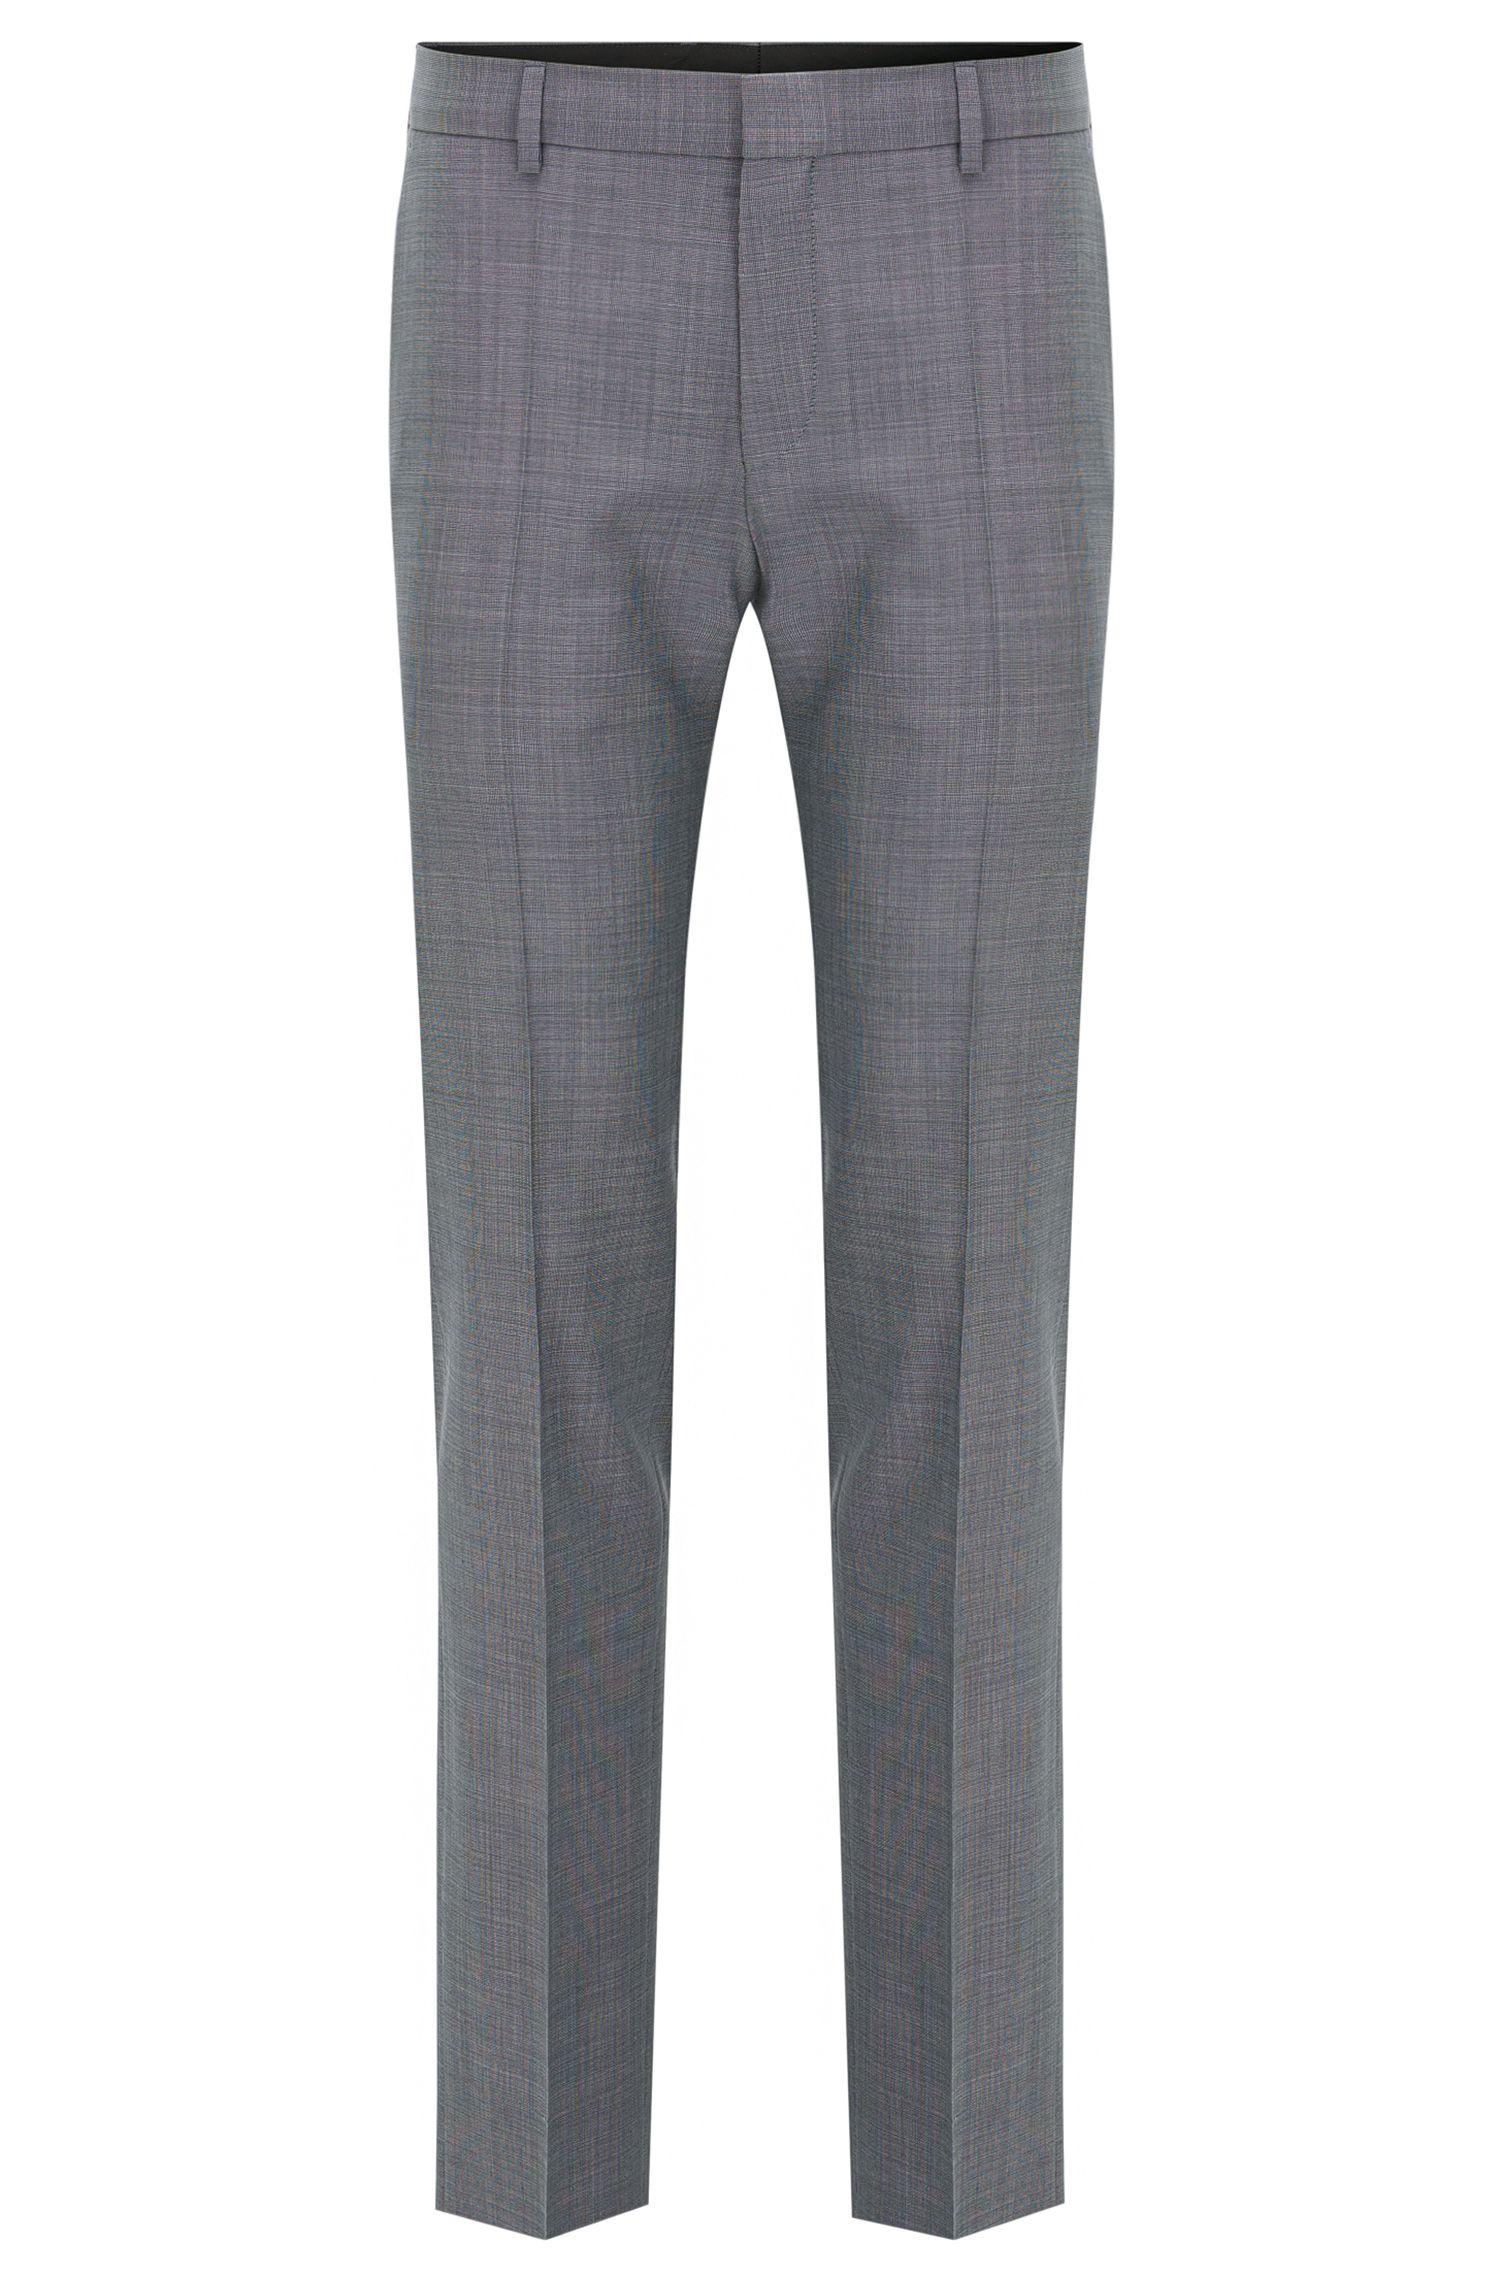 Basketweave Super 100 Virgin Wool Dress Pant, Slim Fit | C-Genius